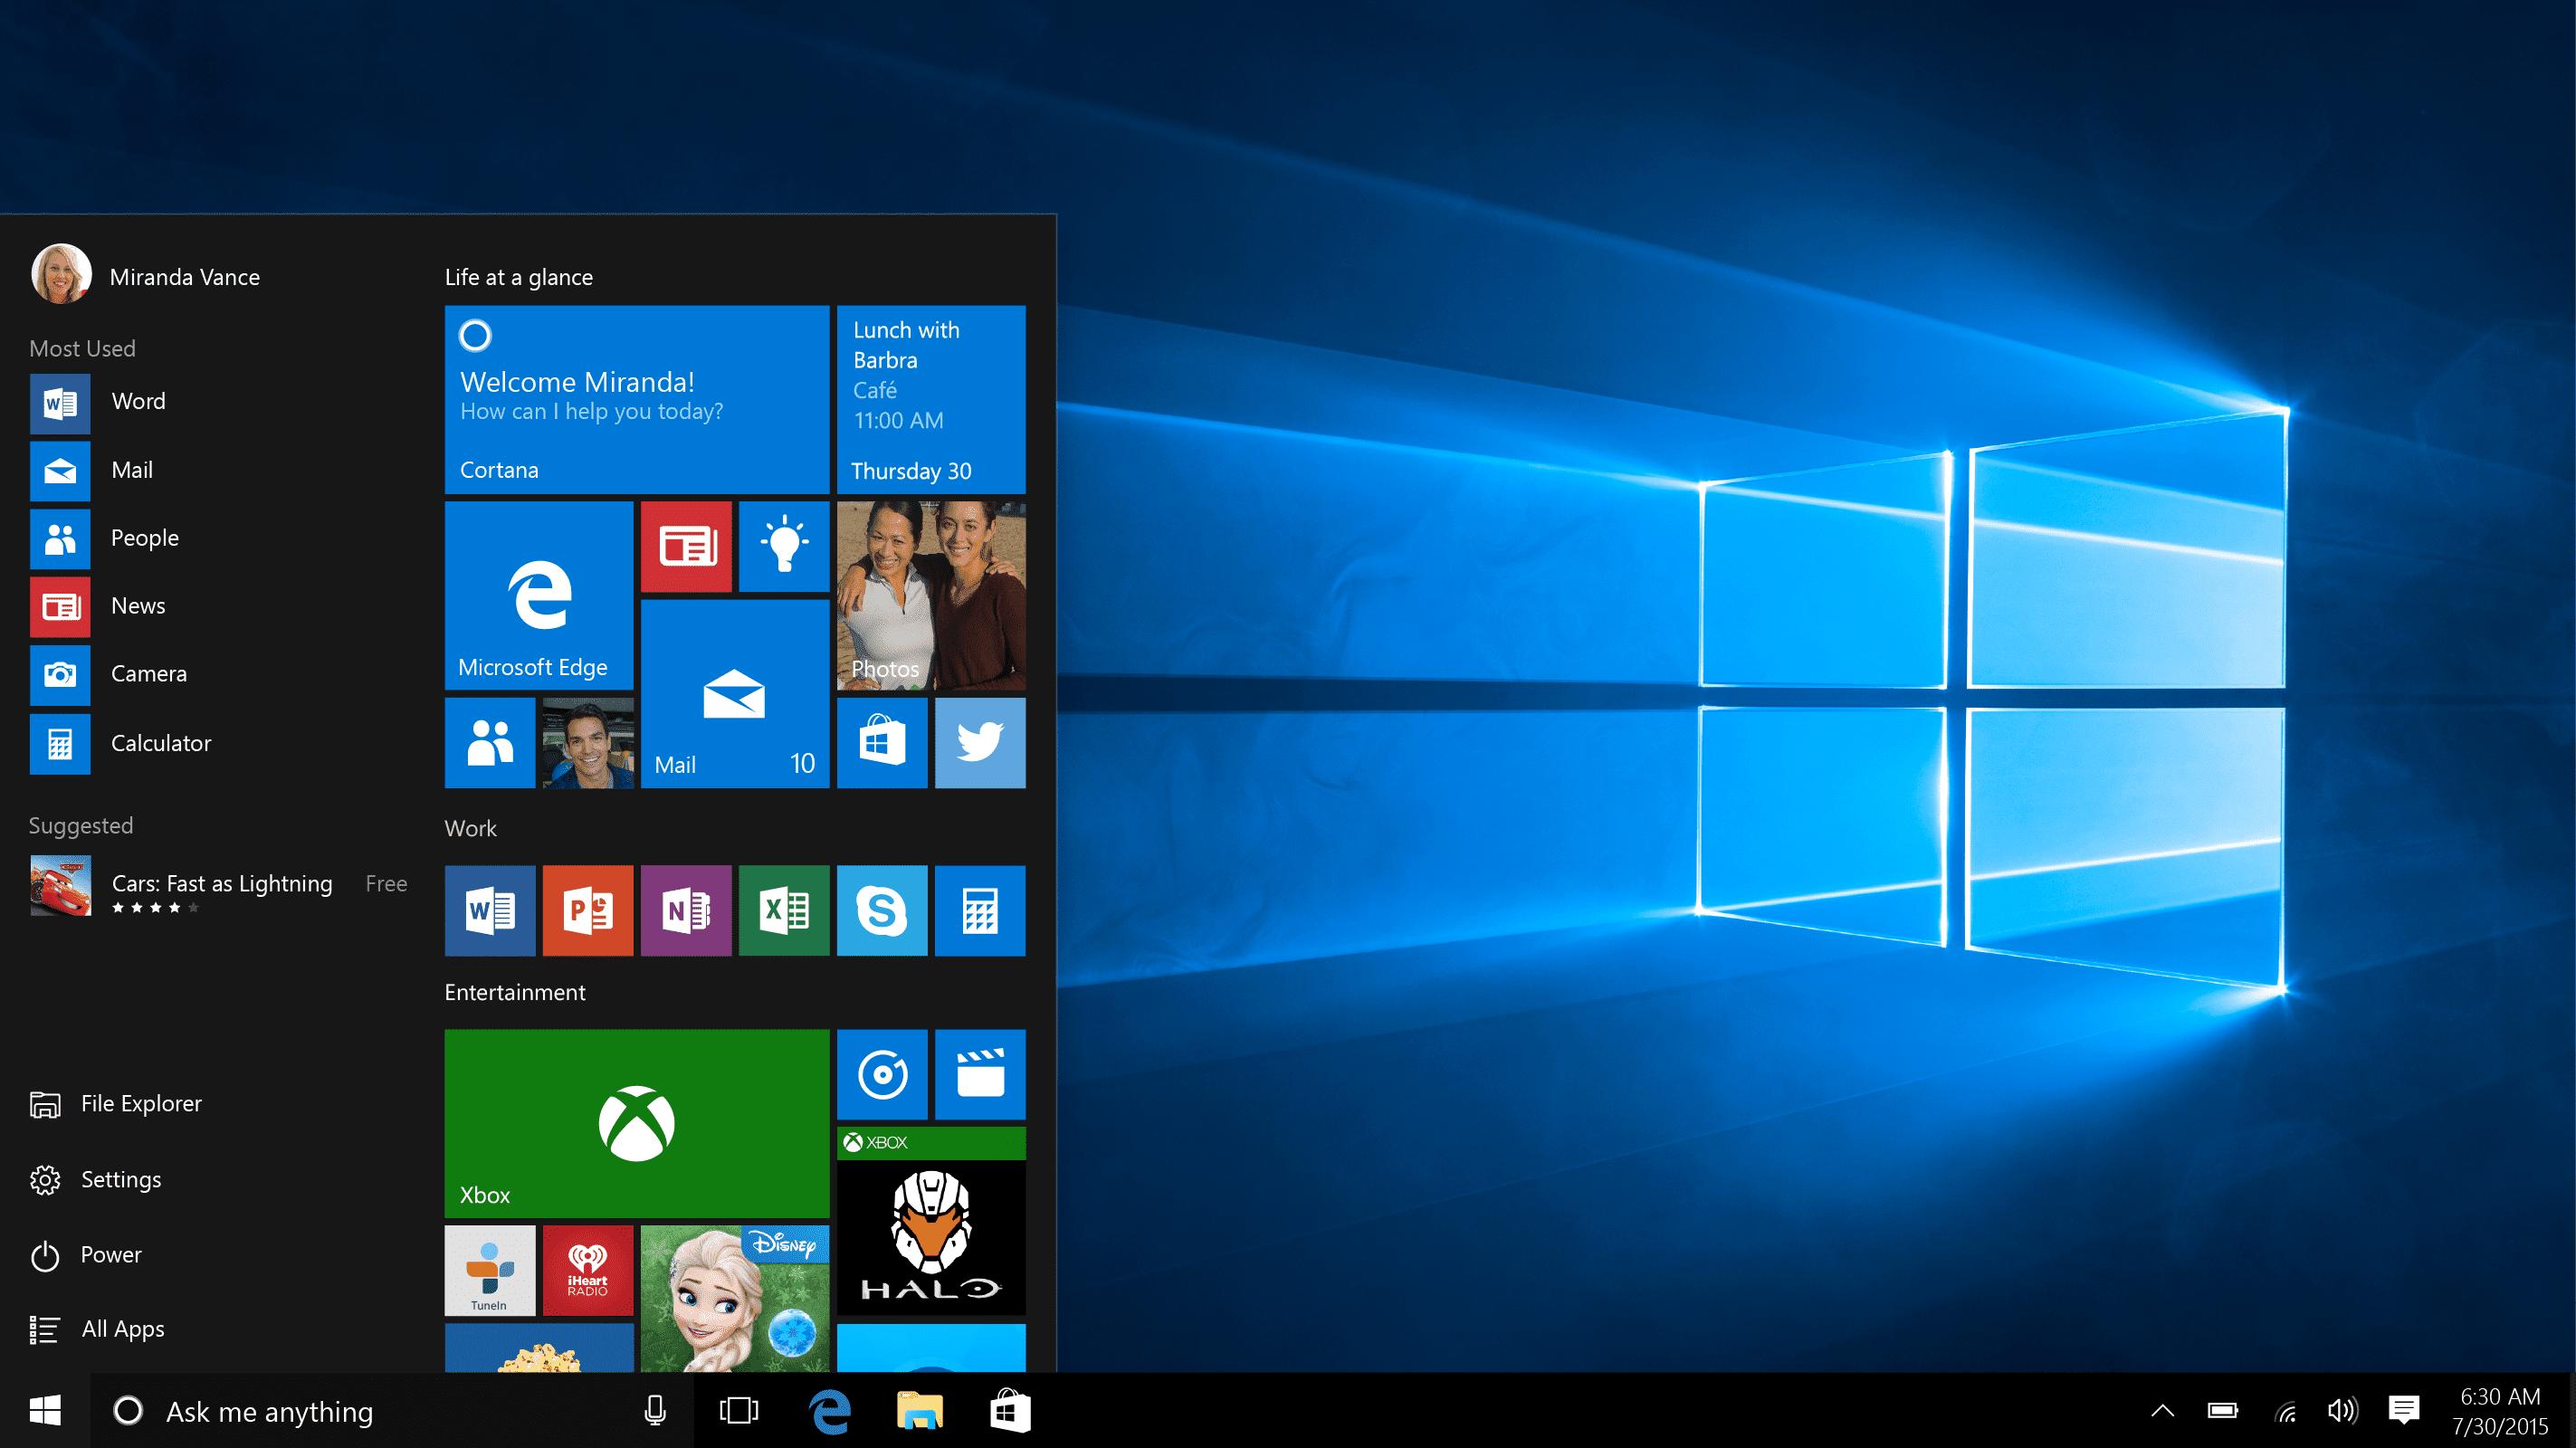 The Windows 10 desktop